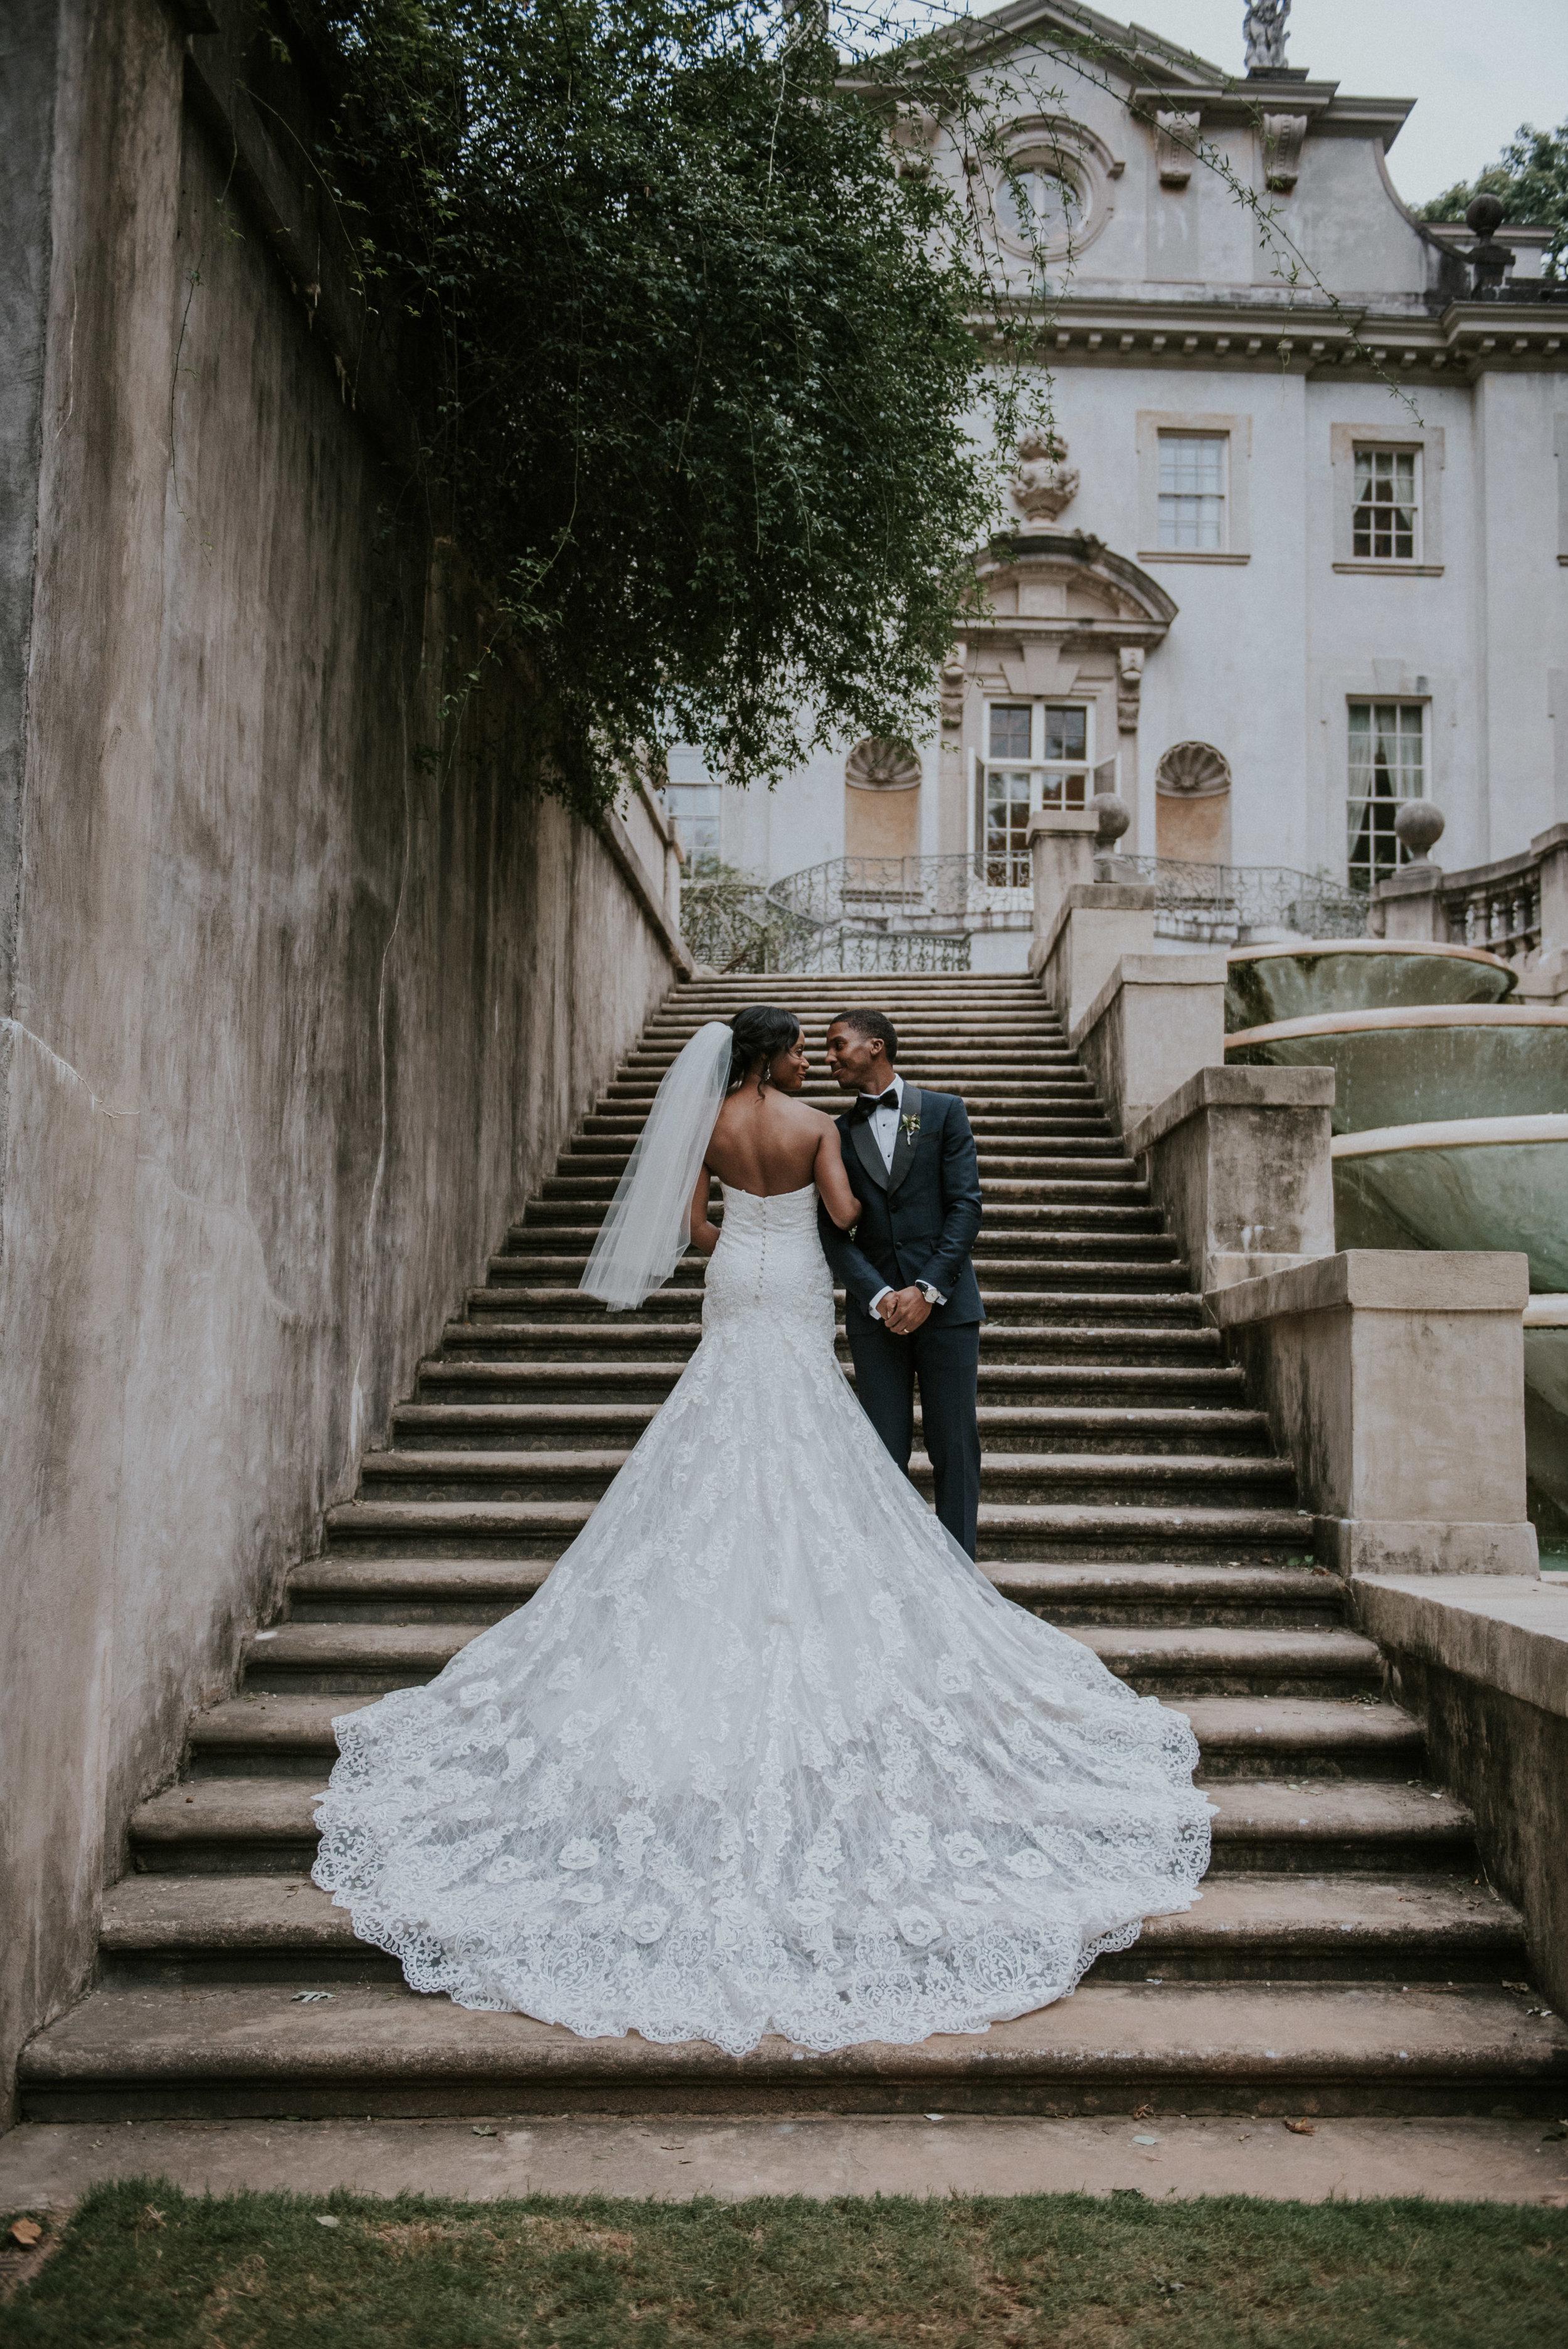 Bride's Martina Liana wedding dress on Swan House steps